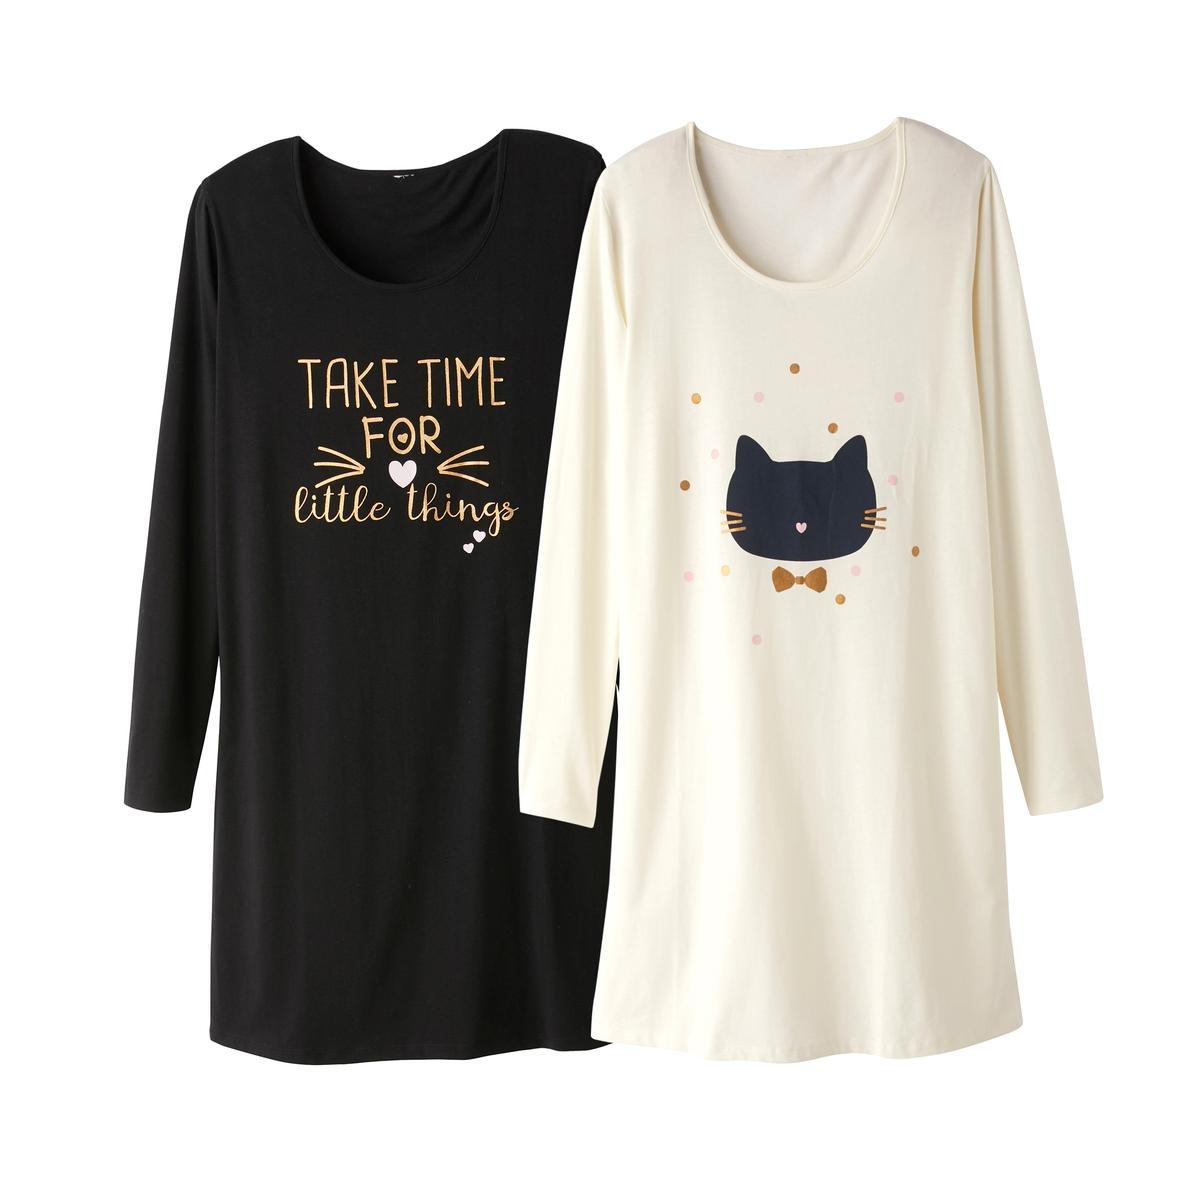 2 рубашки ночные с рисунком